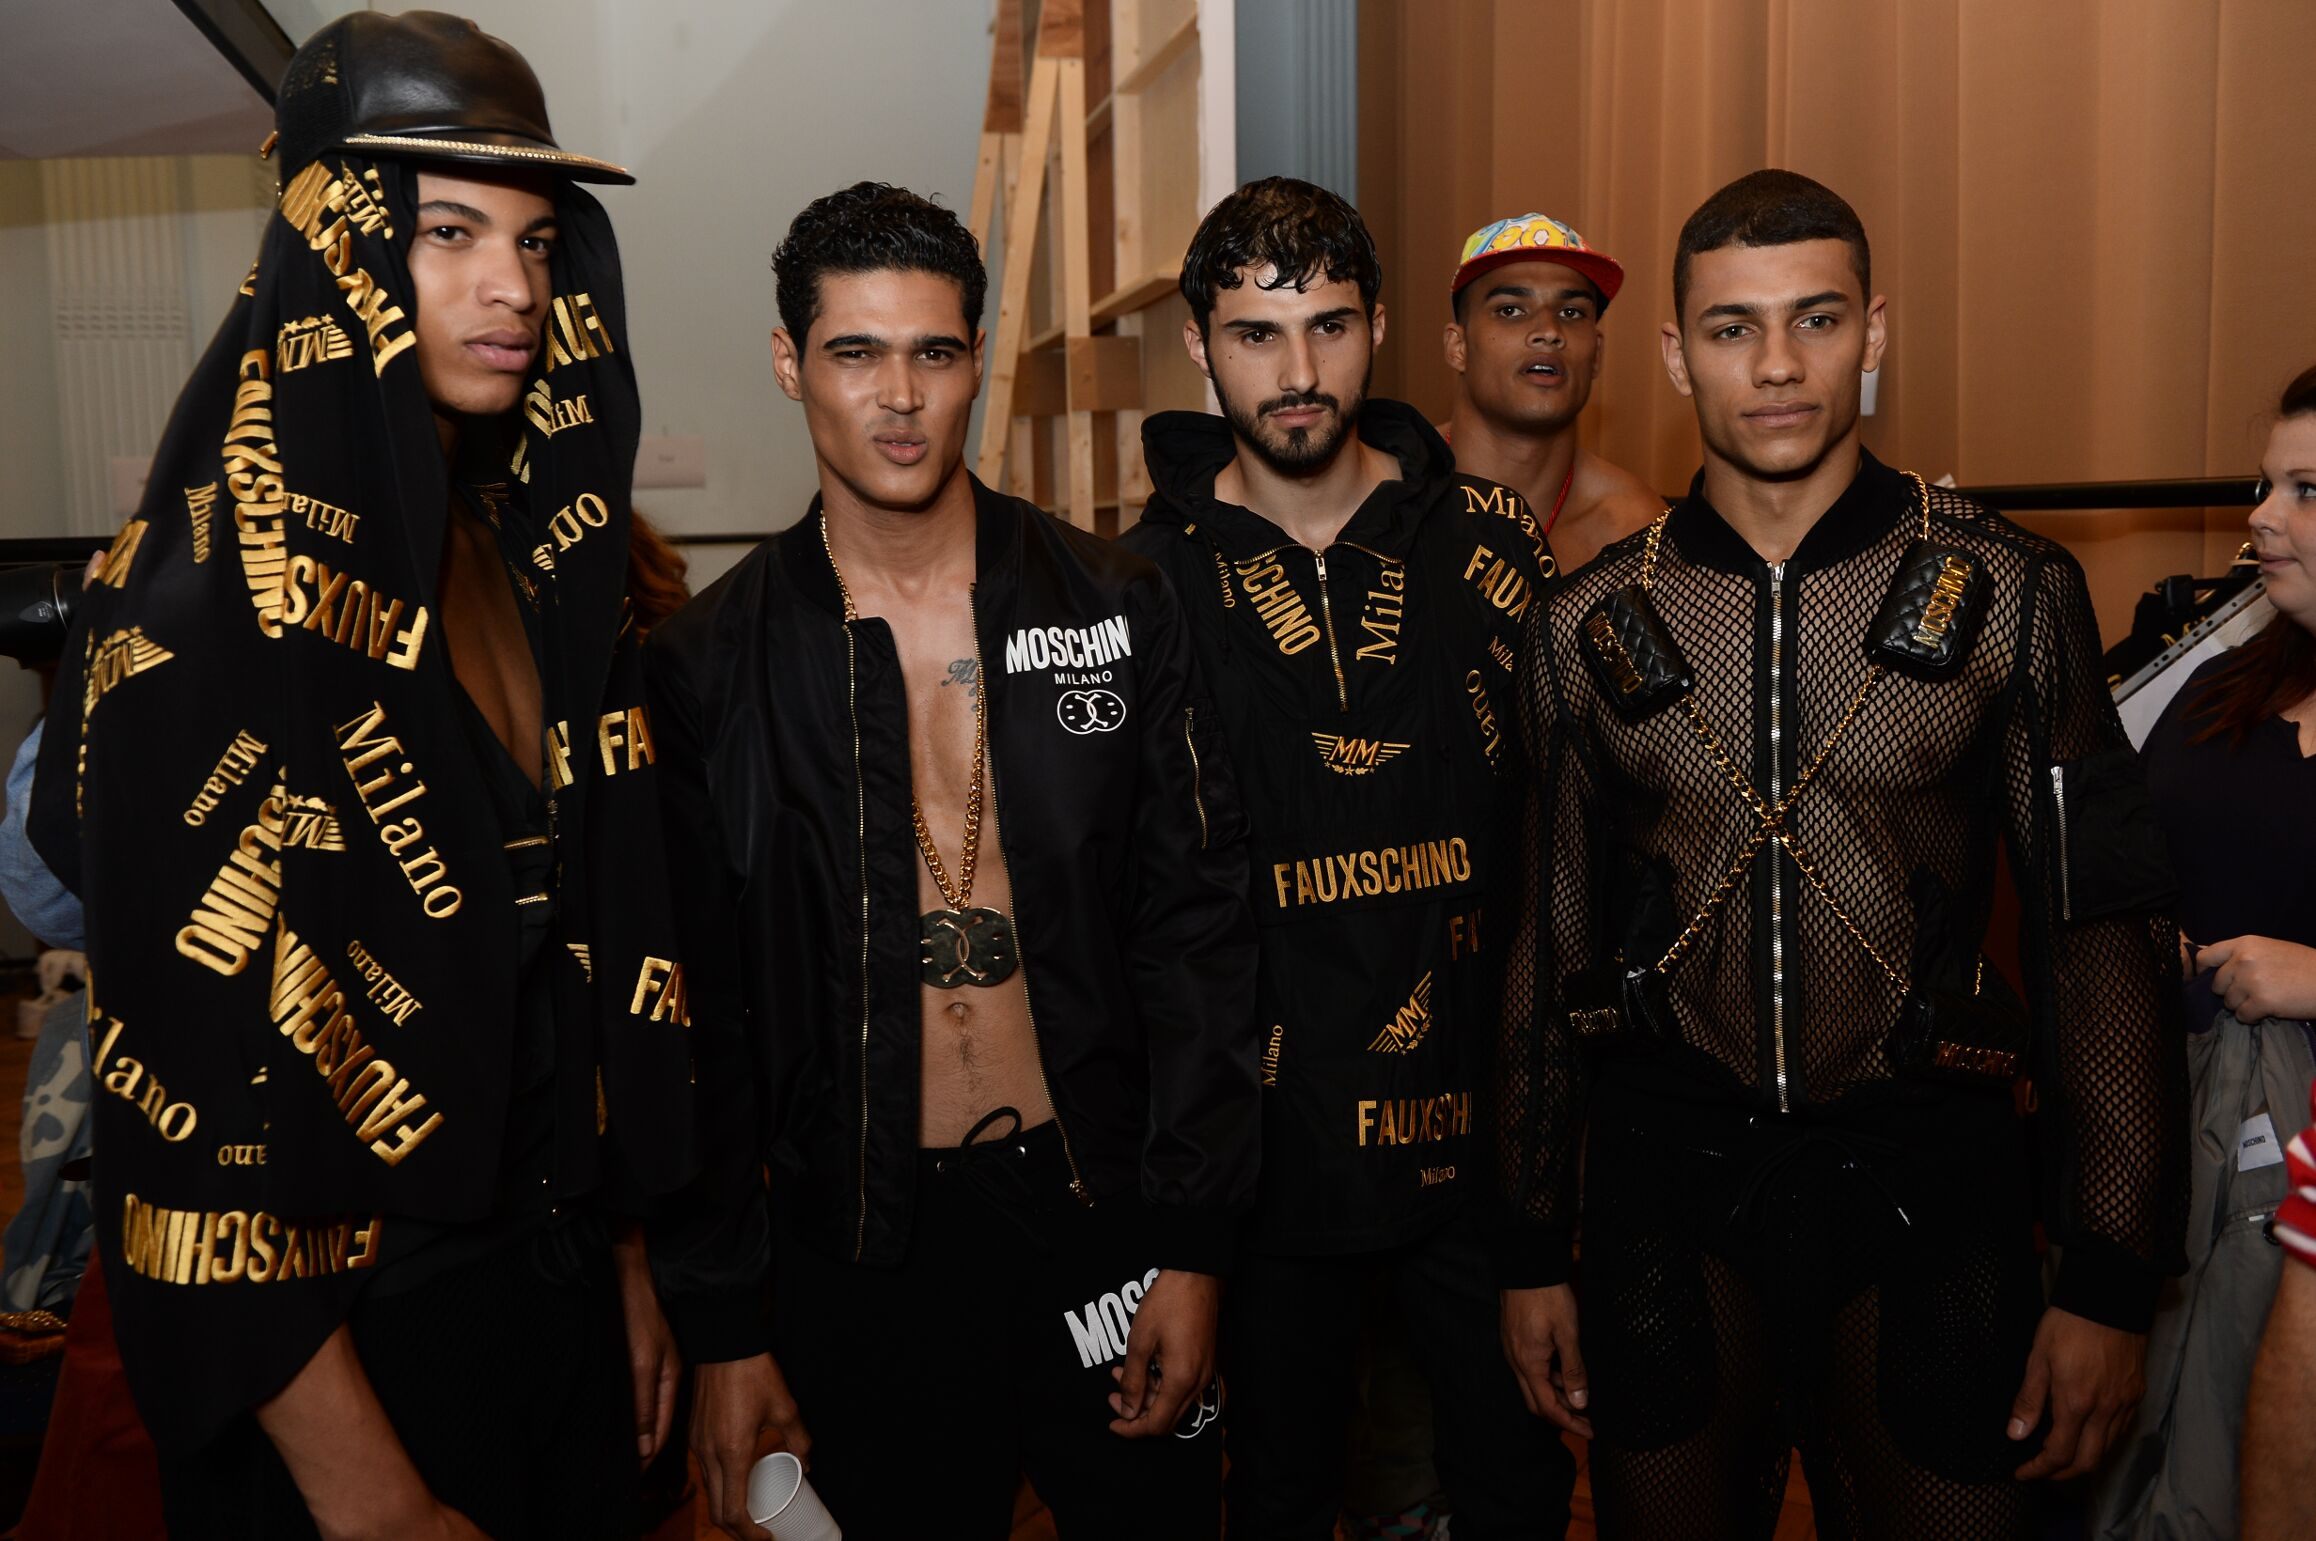 Backstage Moschino Men Models